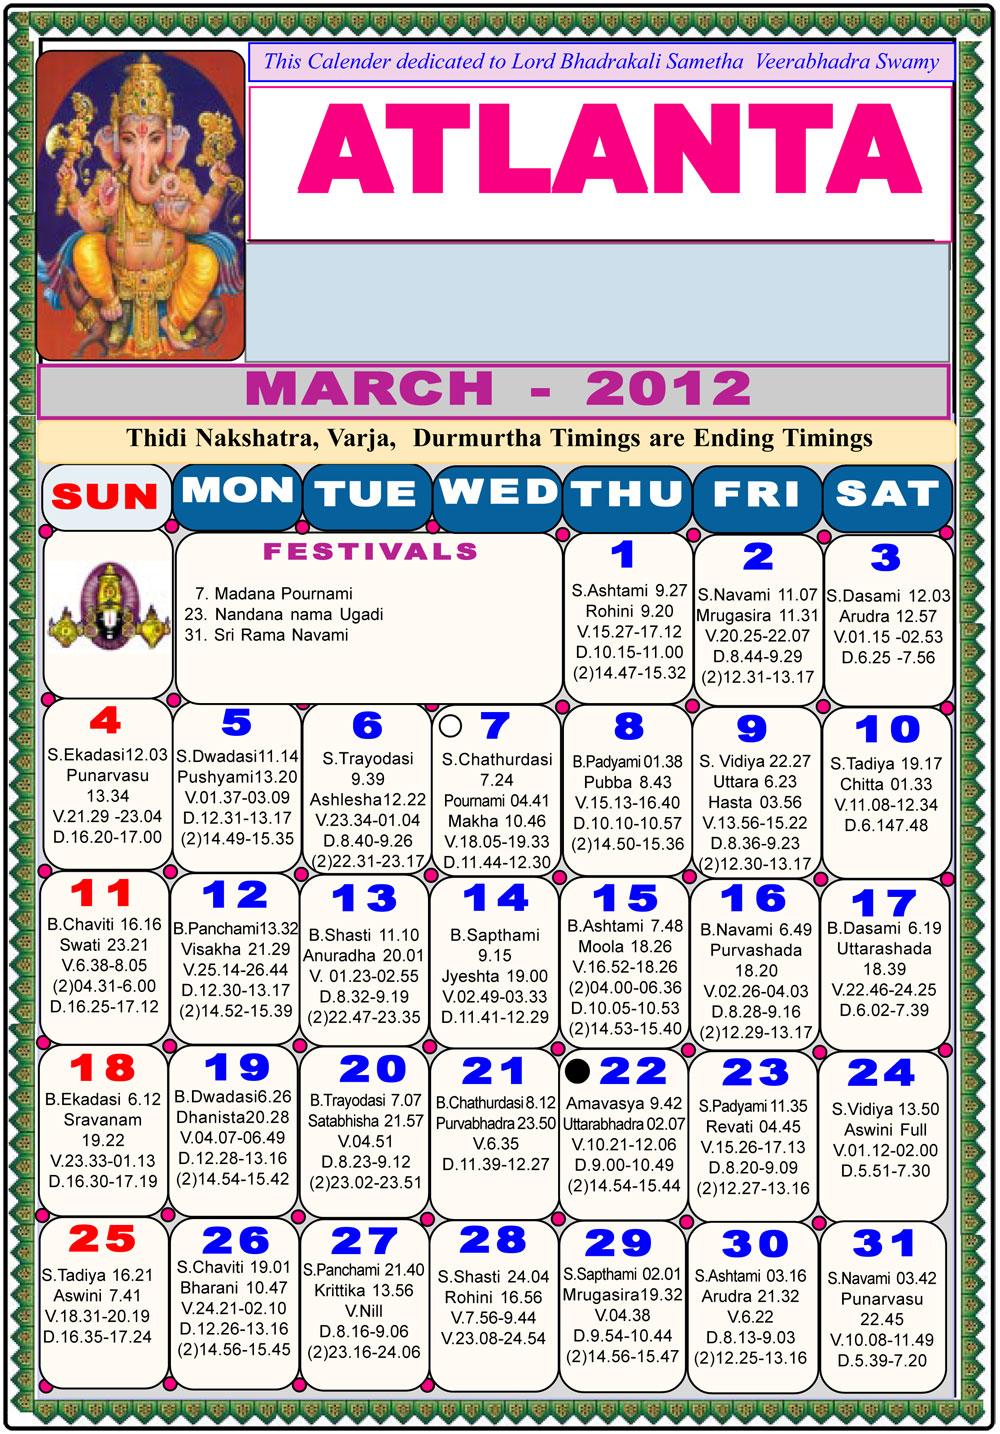 Telugu Calendar 2022 Atlanta.Atlanta Telugu Calendar 2012 Atlanta Telugu Calendar 2011 Atlanta Telugu Calendar 2010 Atlanta Telugu Calendar 2009 Atlanta Telugu Calendar 2008 Atlanta Telugu Calendar 2007